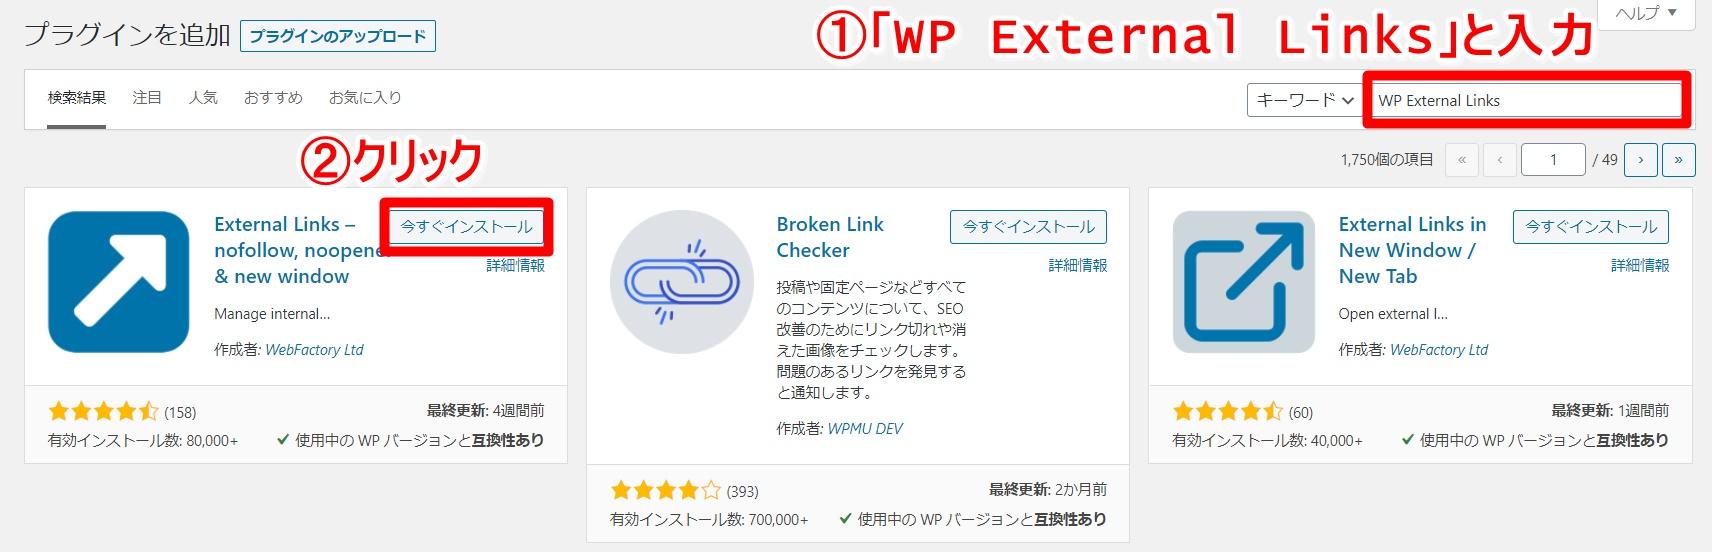 WP External Linksのインストール方法